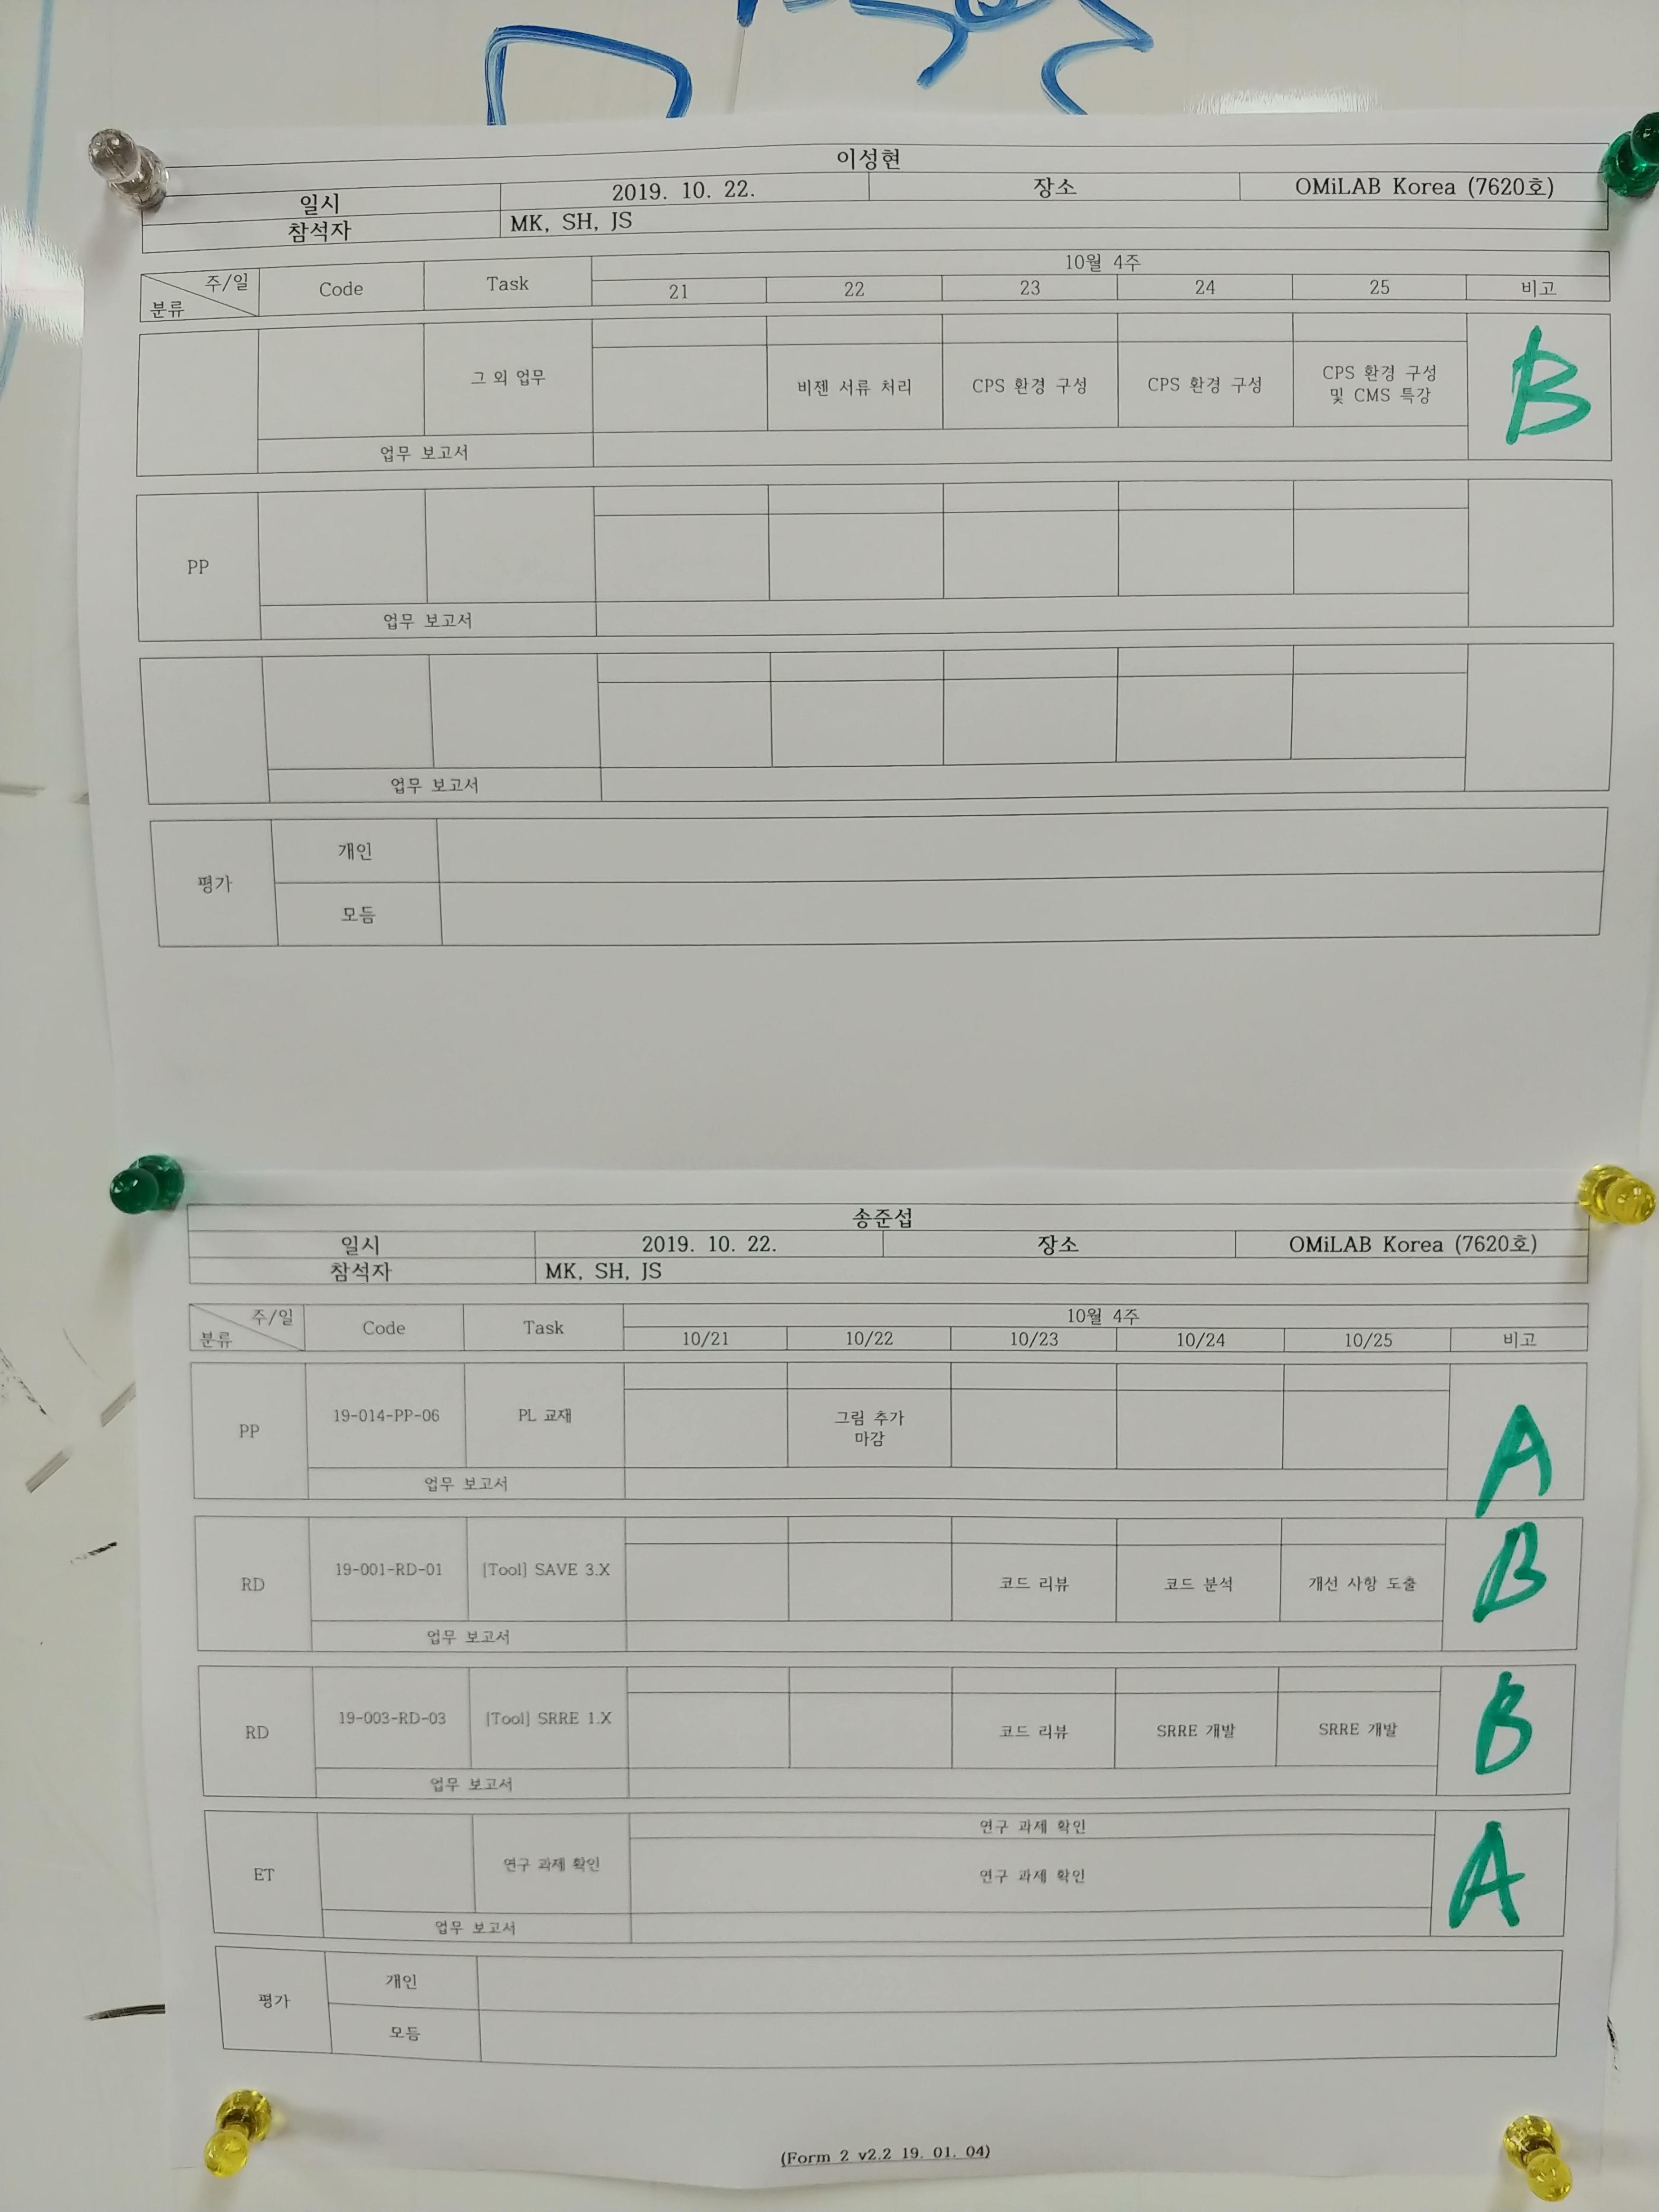 5-Fri-2019-10-25-Evaluation.jpg